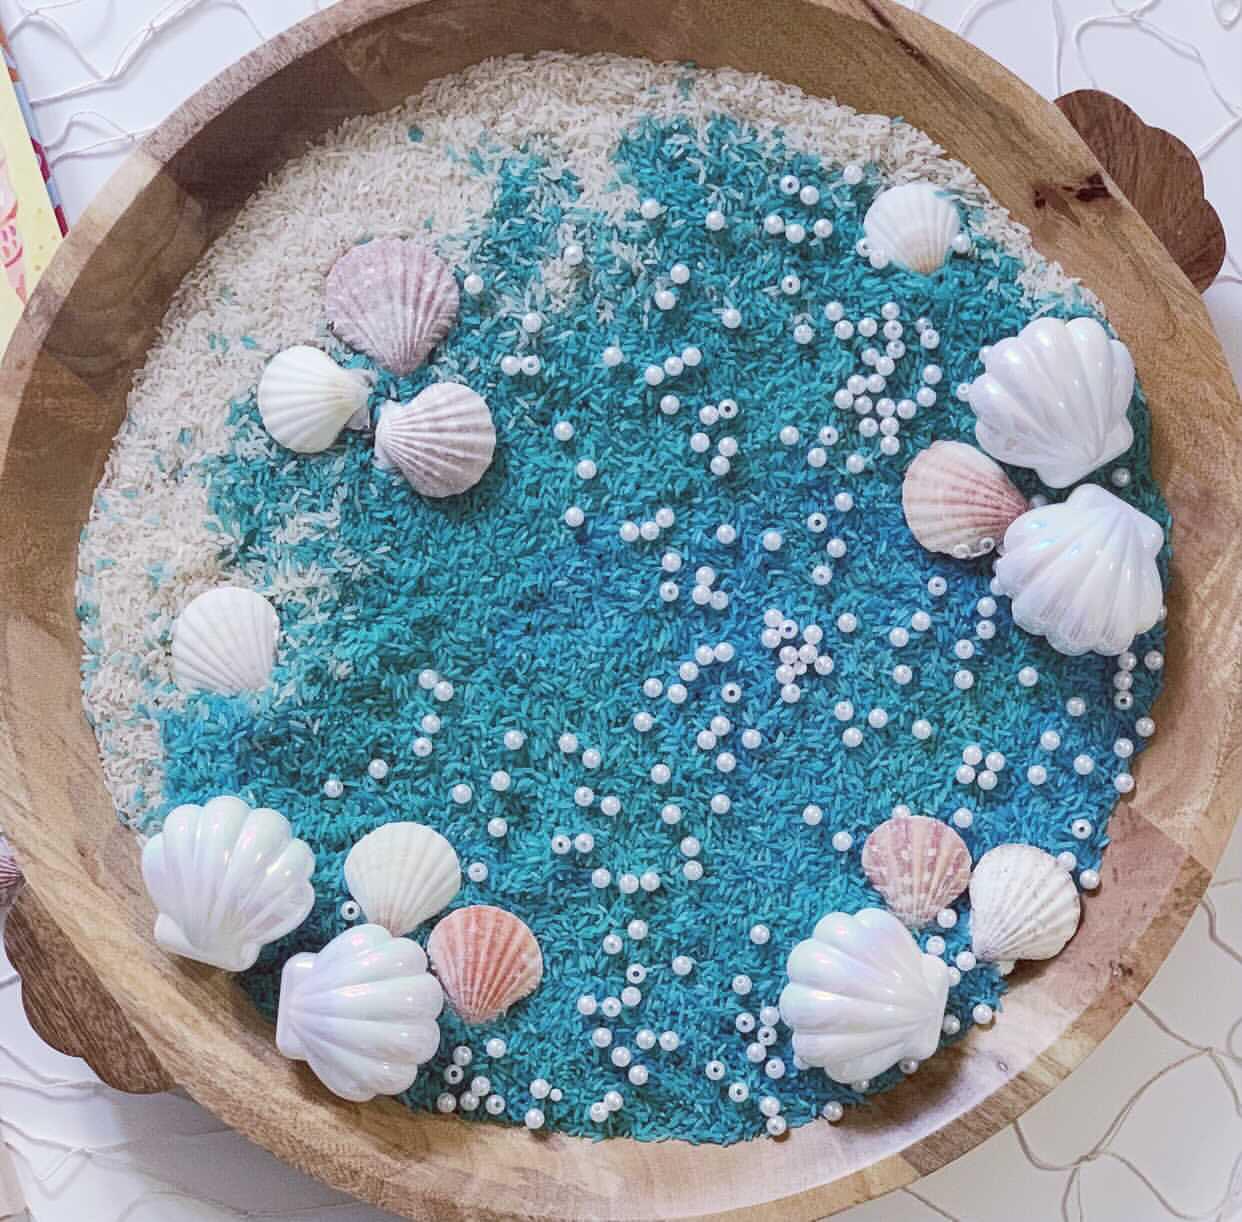 Beach sensory play tray for kids